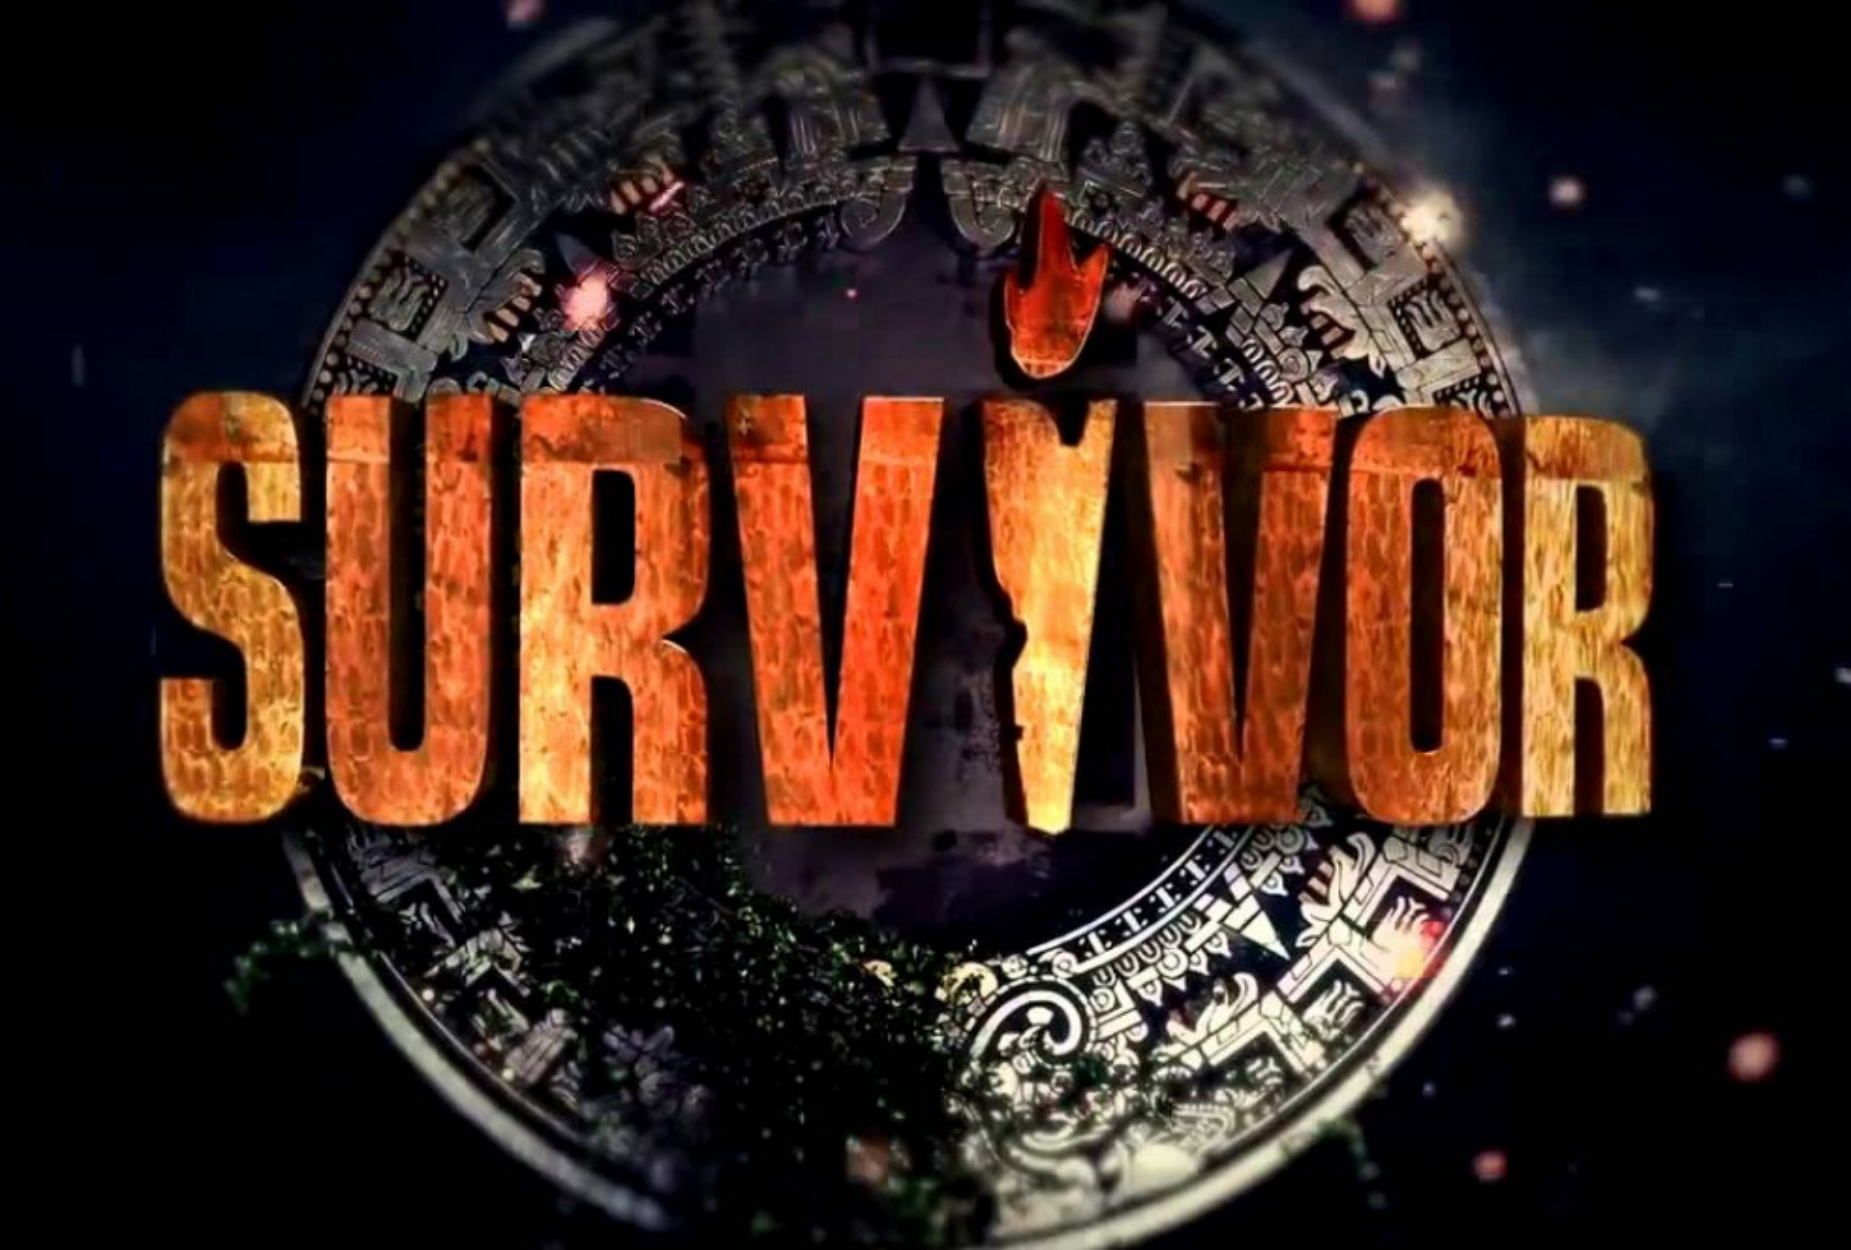 Survivor: Αποφάσεις που ανατρέπουν τα δεδομένα – Τι αλλάζει στο παιχνίδι